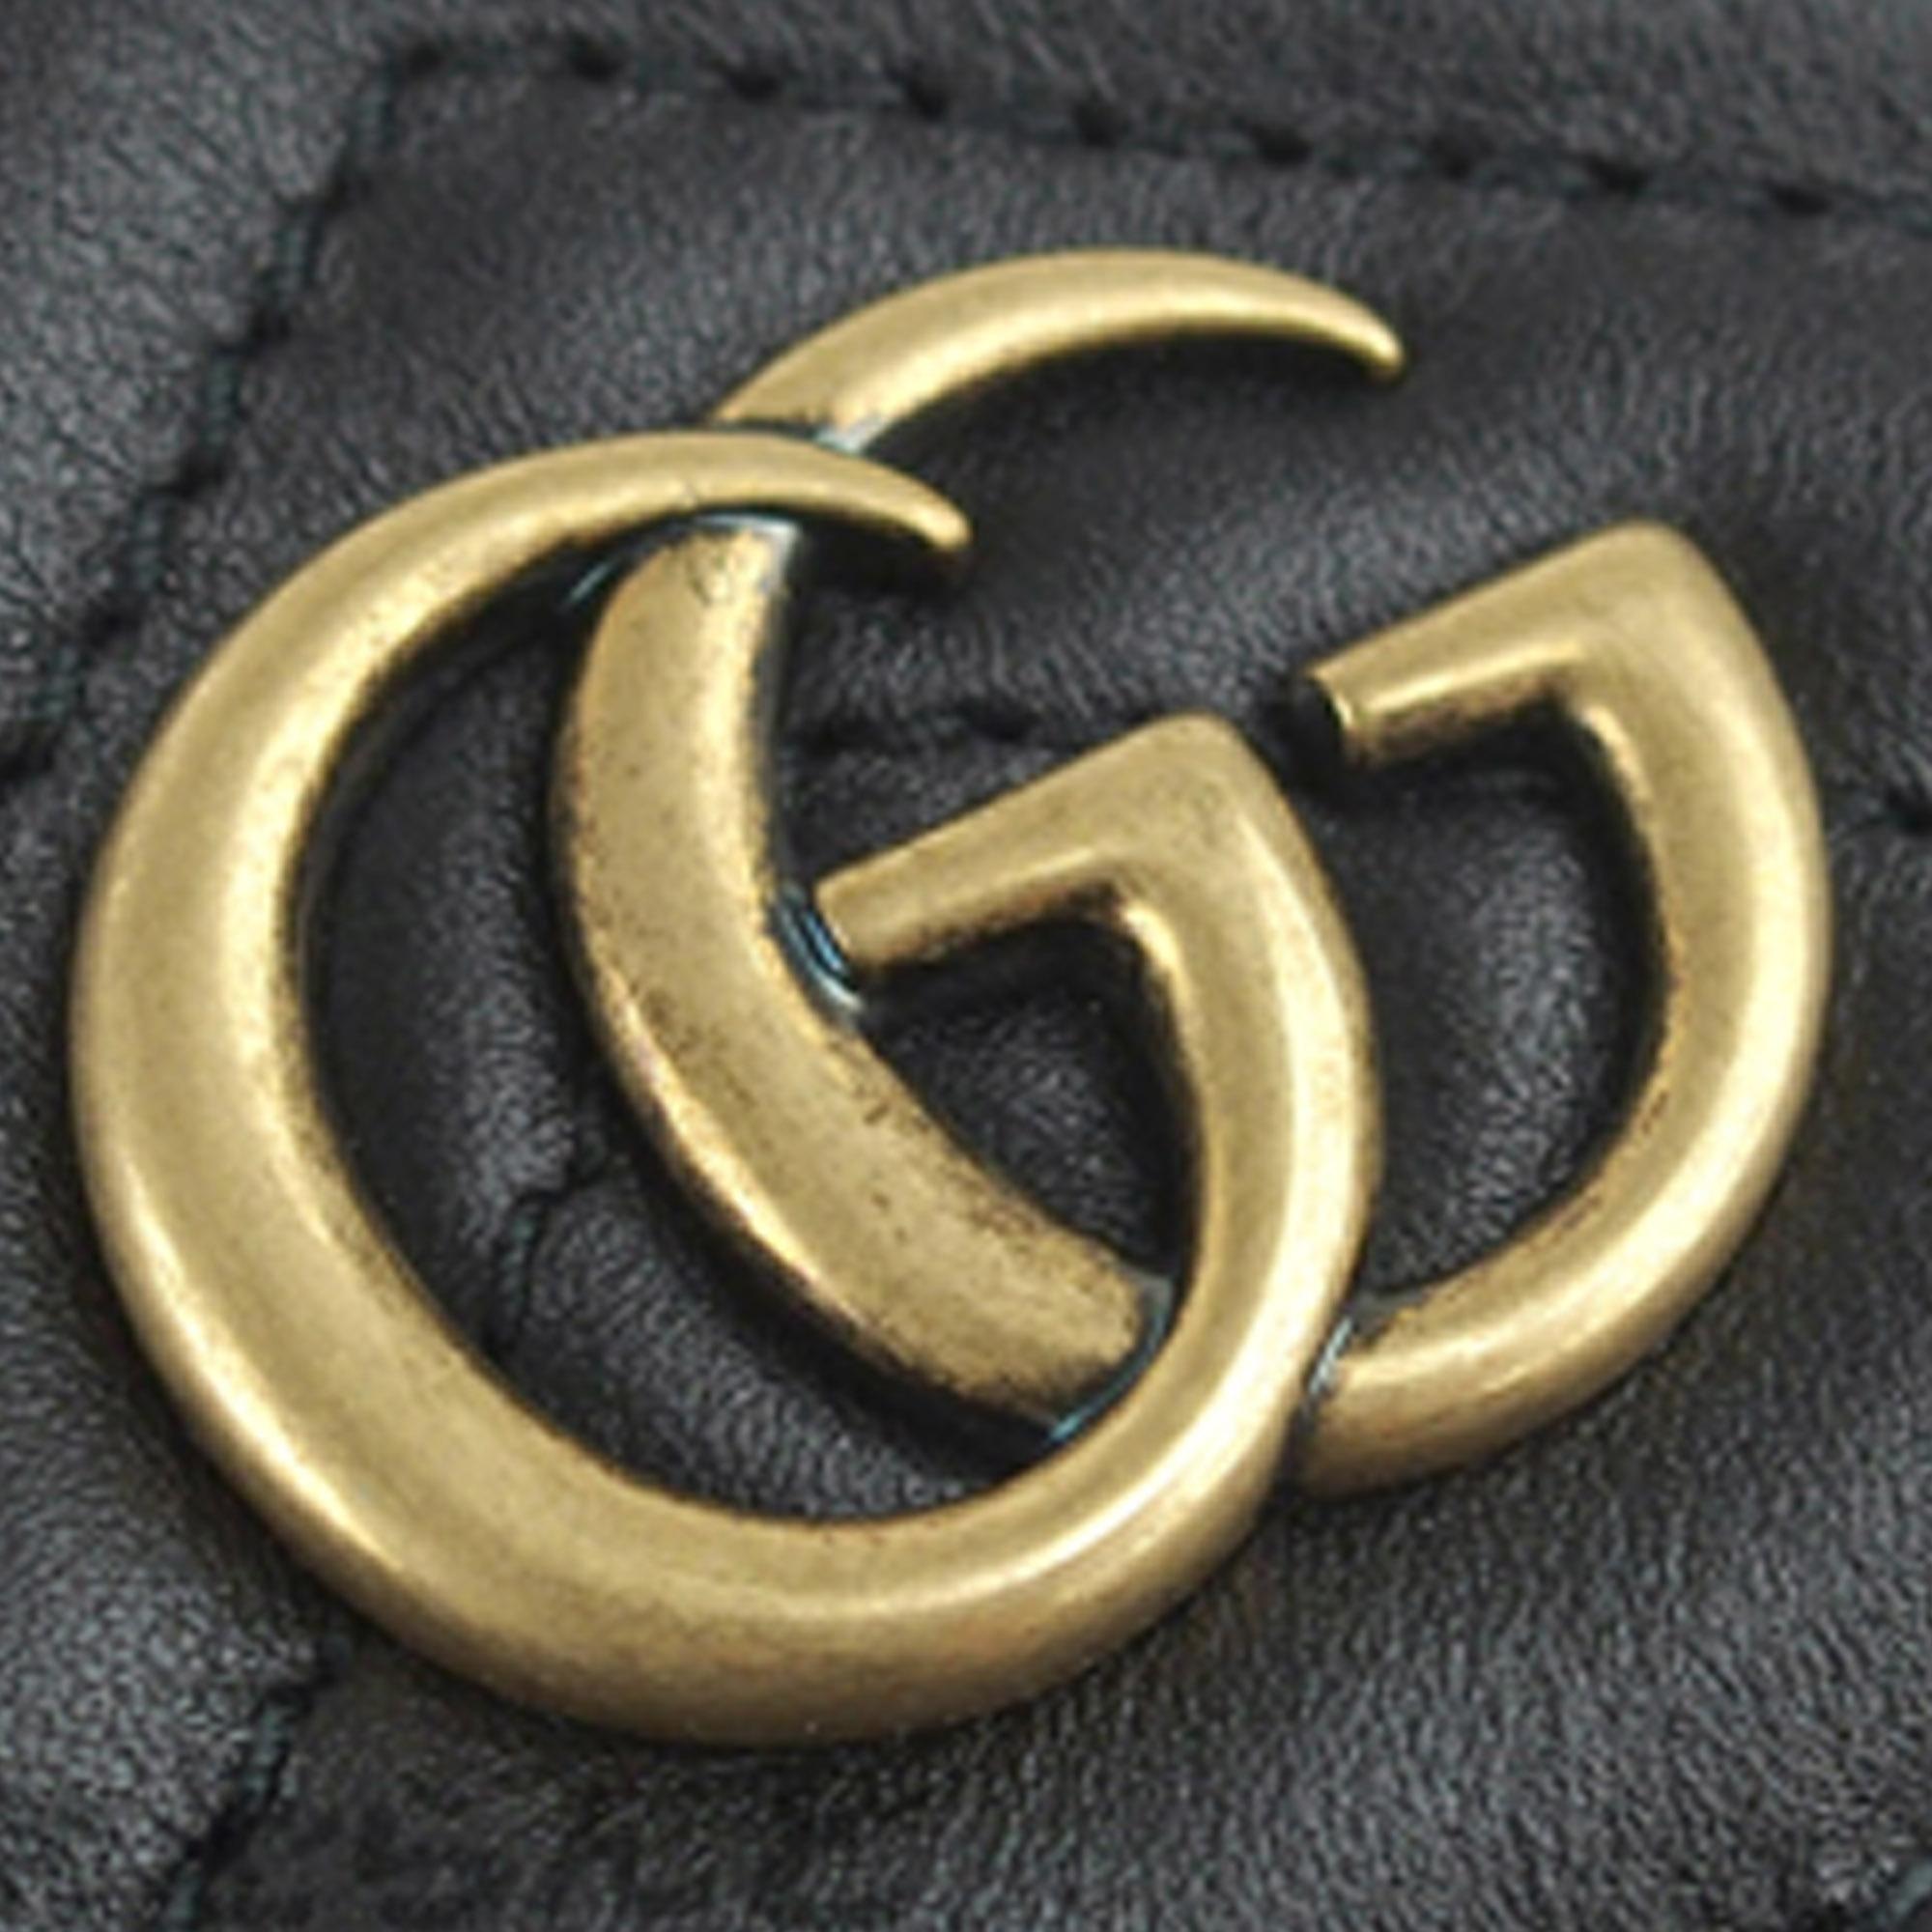 Gucci GG Marmont Rugtas